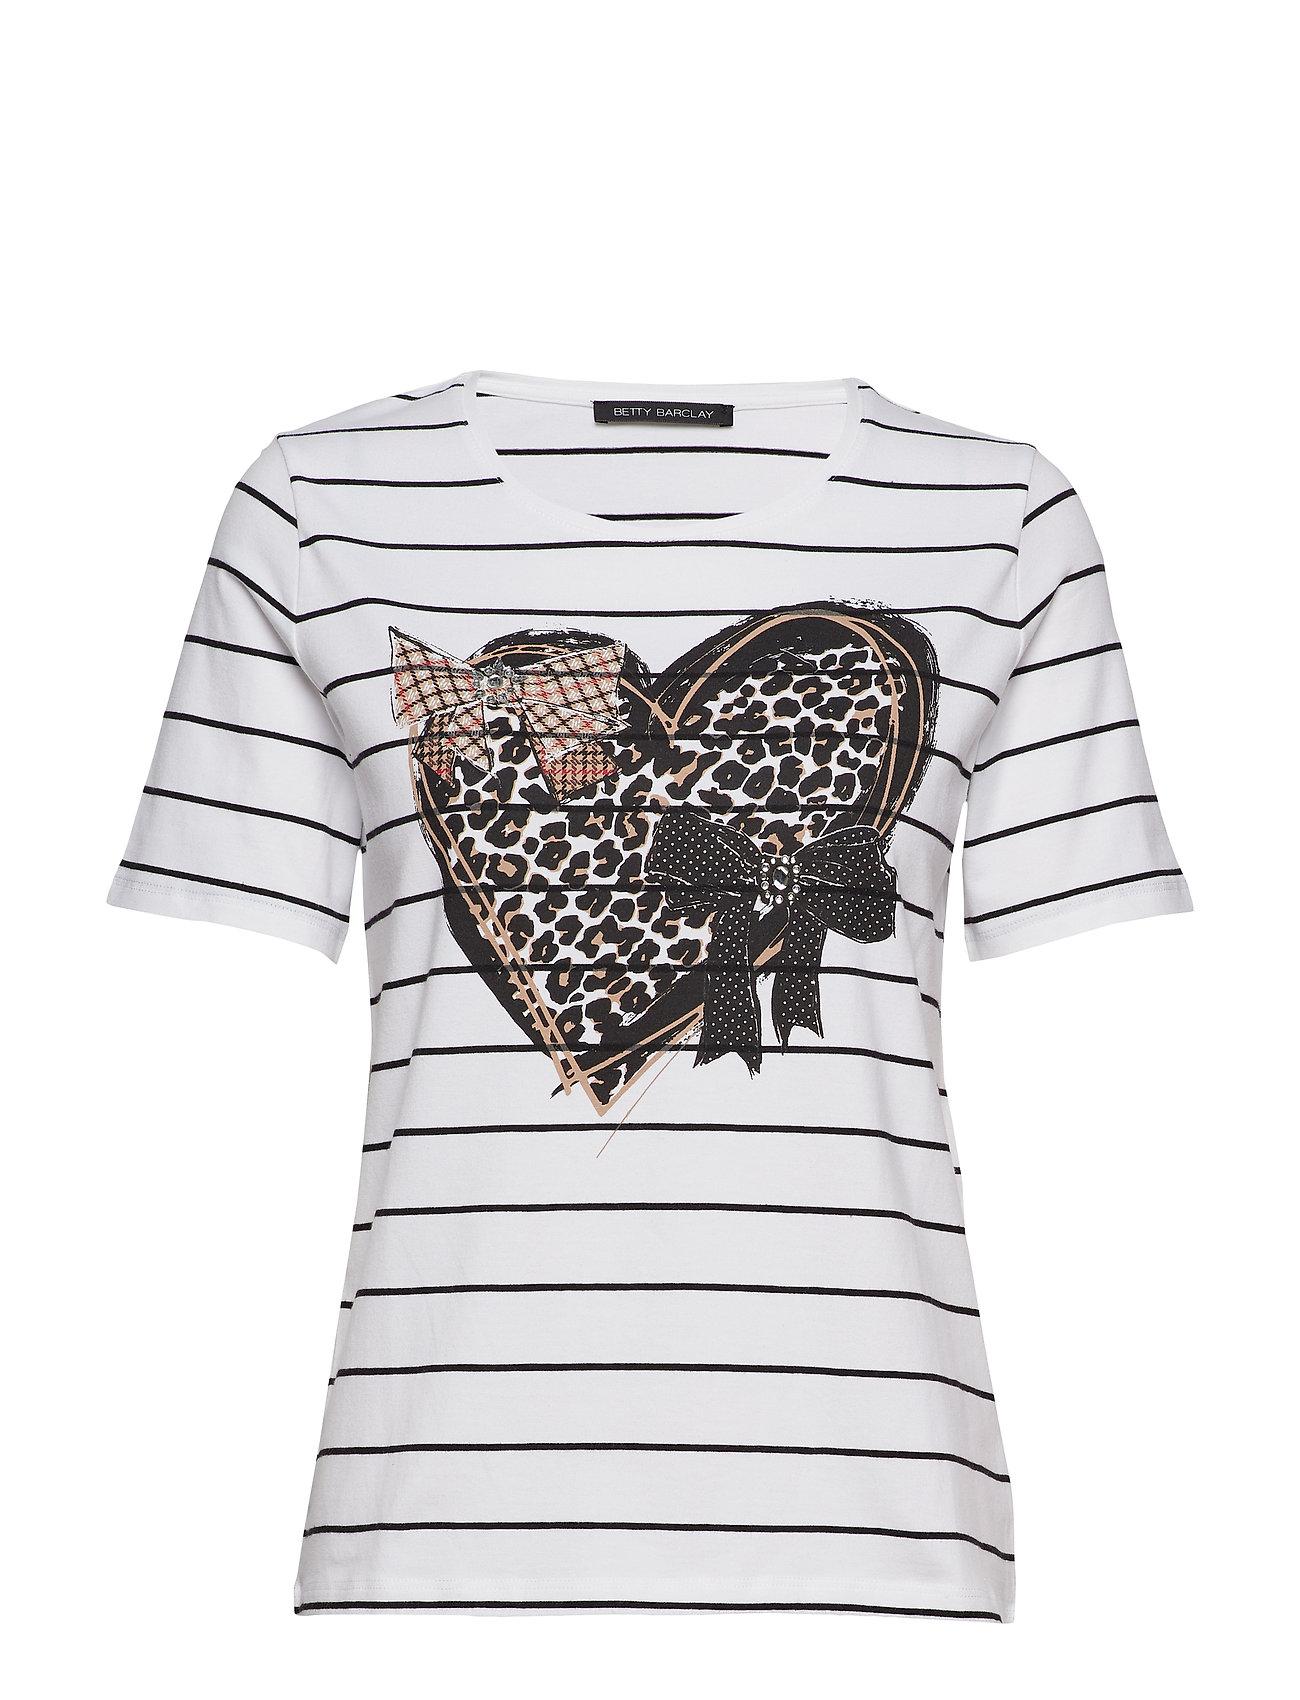 1 Barclay Sleevewhite blackBetty Shirt Short 2 4qS3Rc5jLA